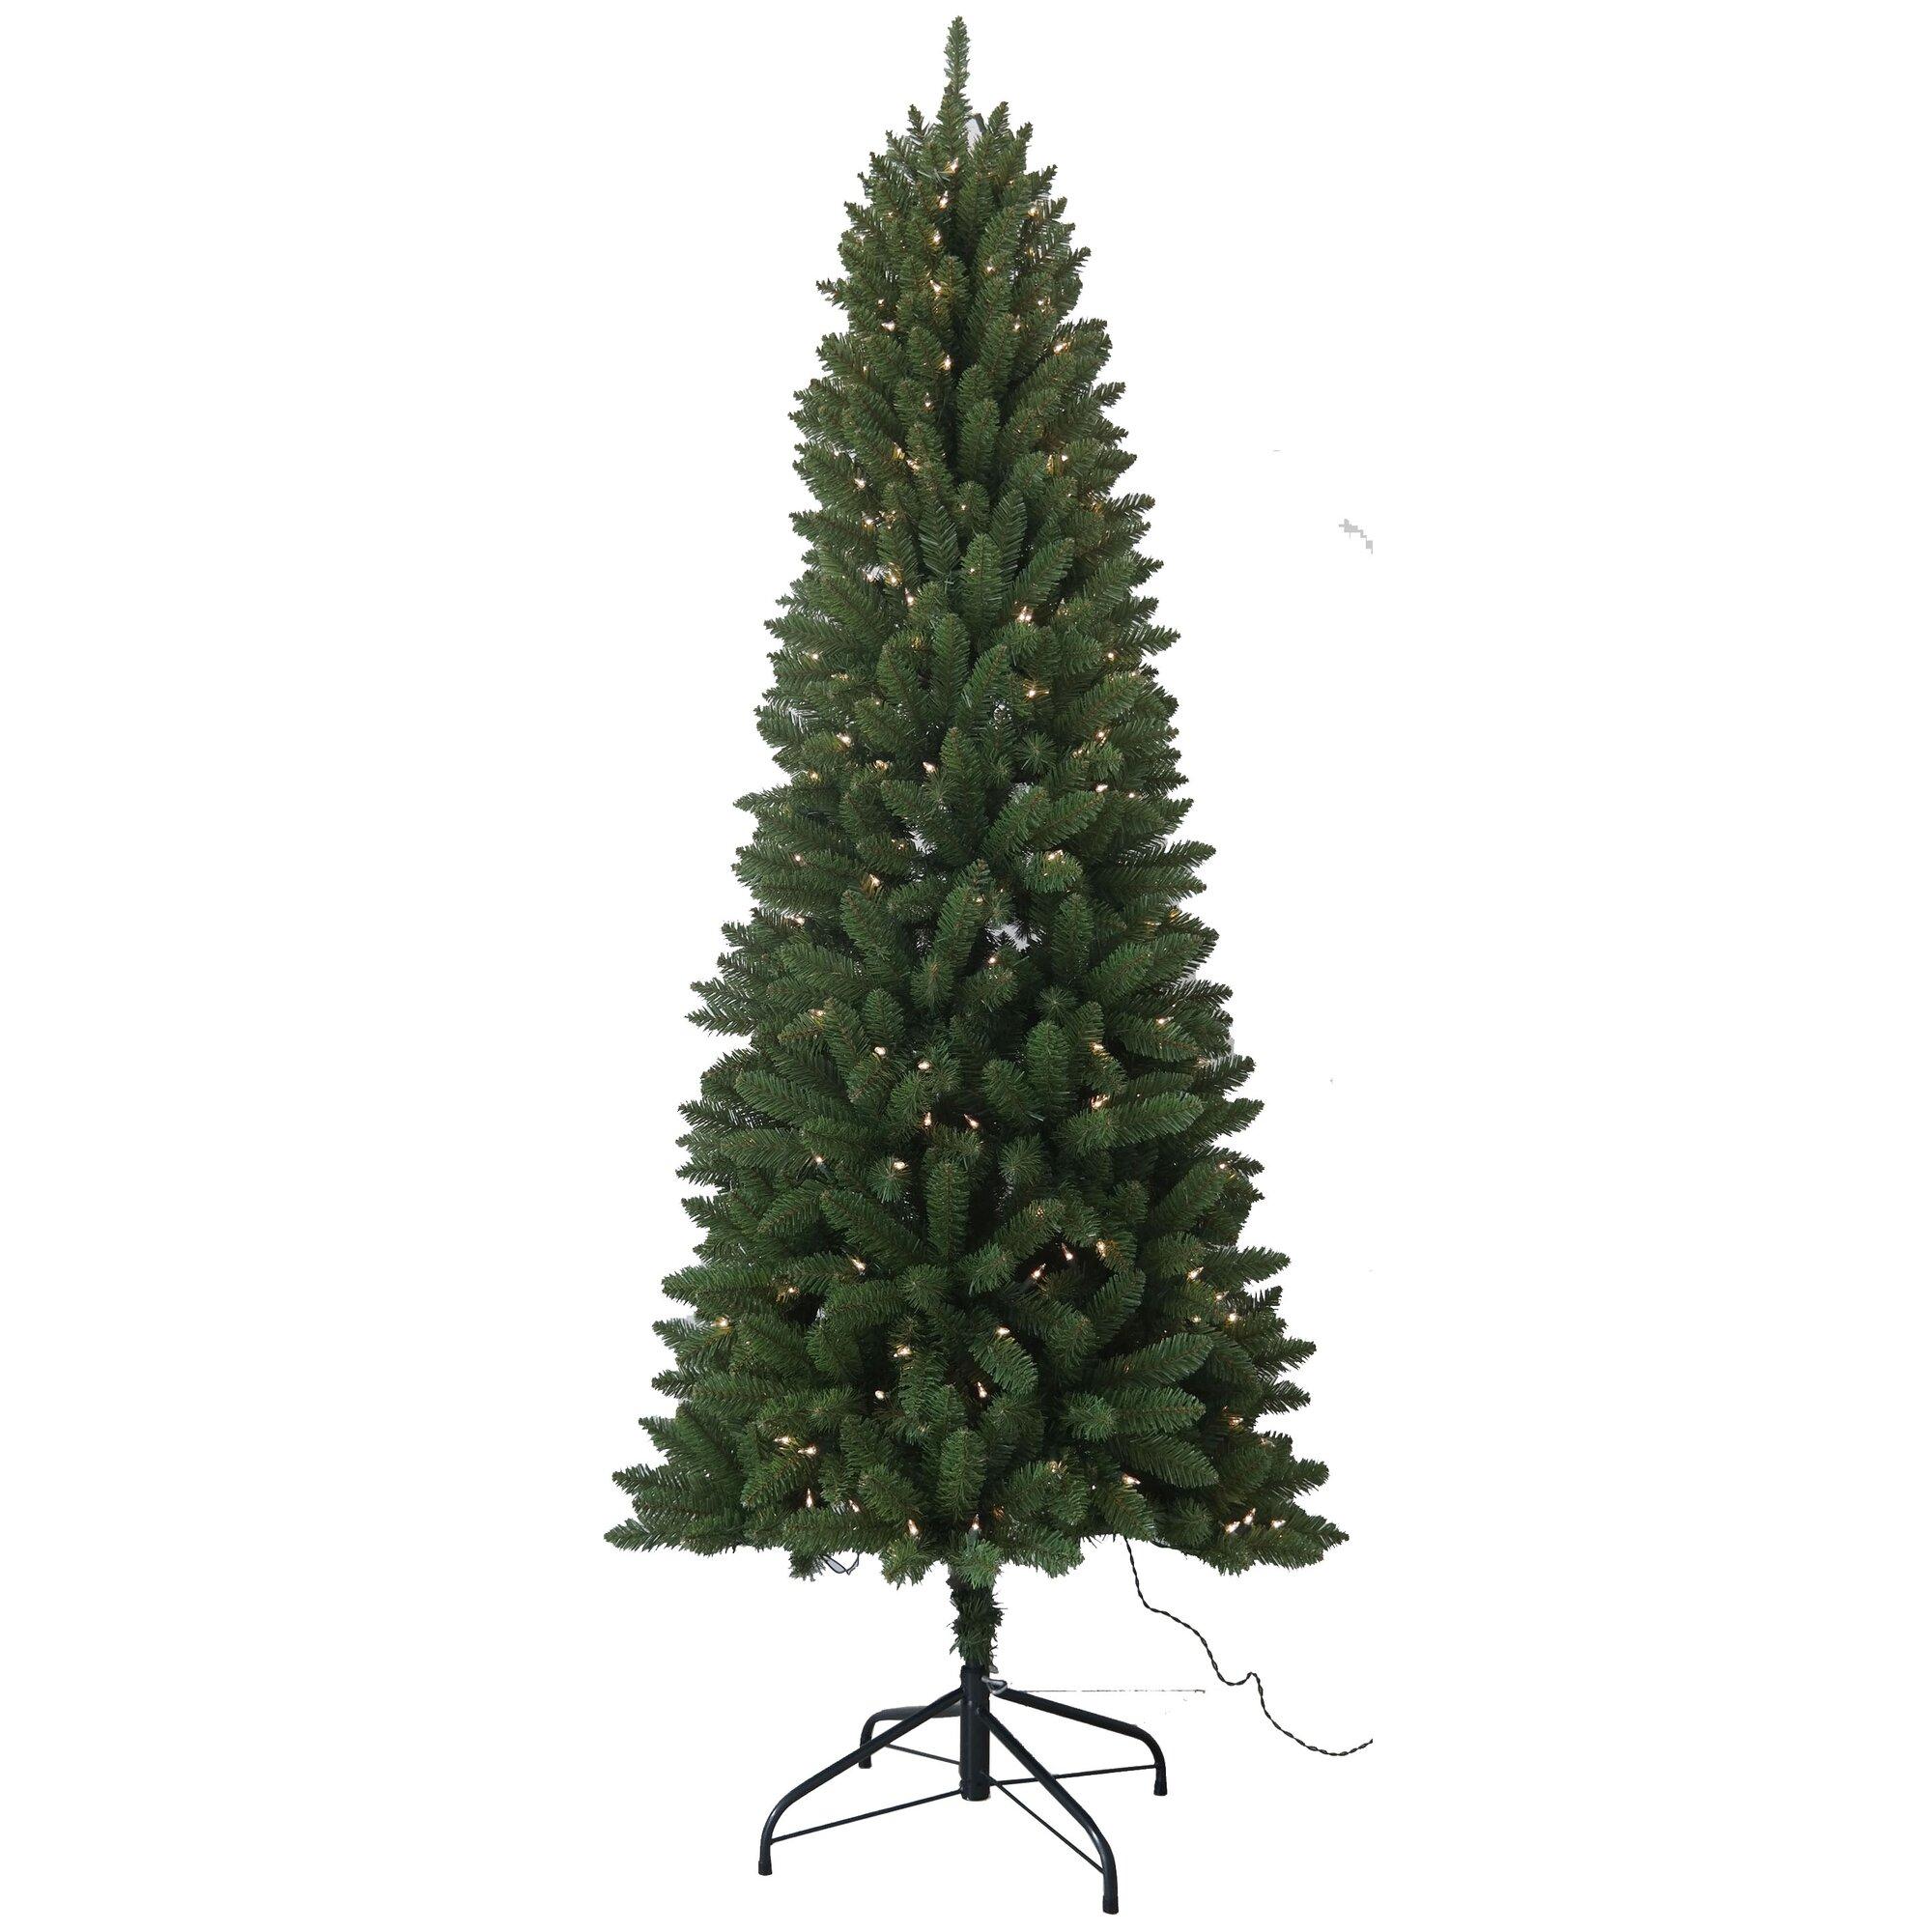 Next Slim Christmas Tree: Santa's Workshop 6.5' Slim Artificial Christmas Tree With